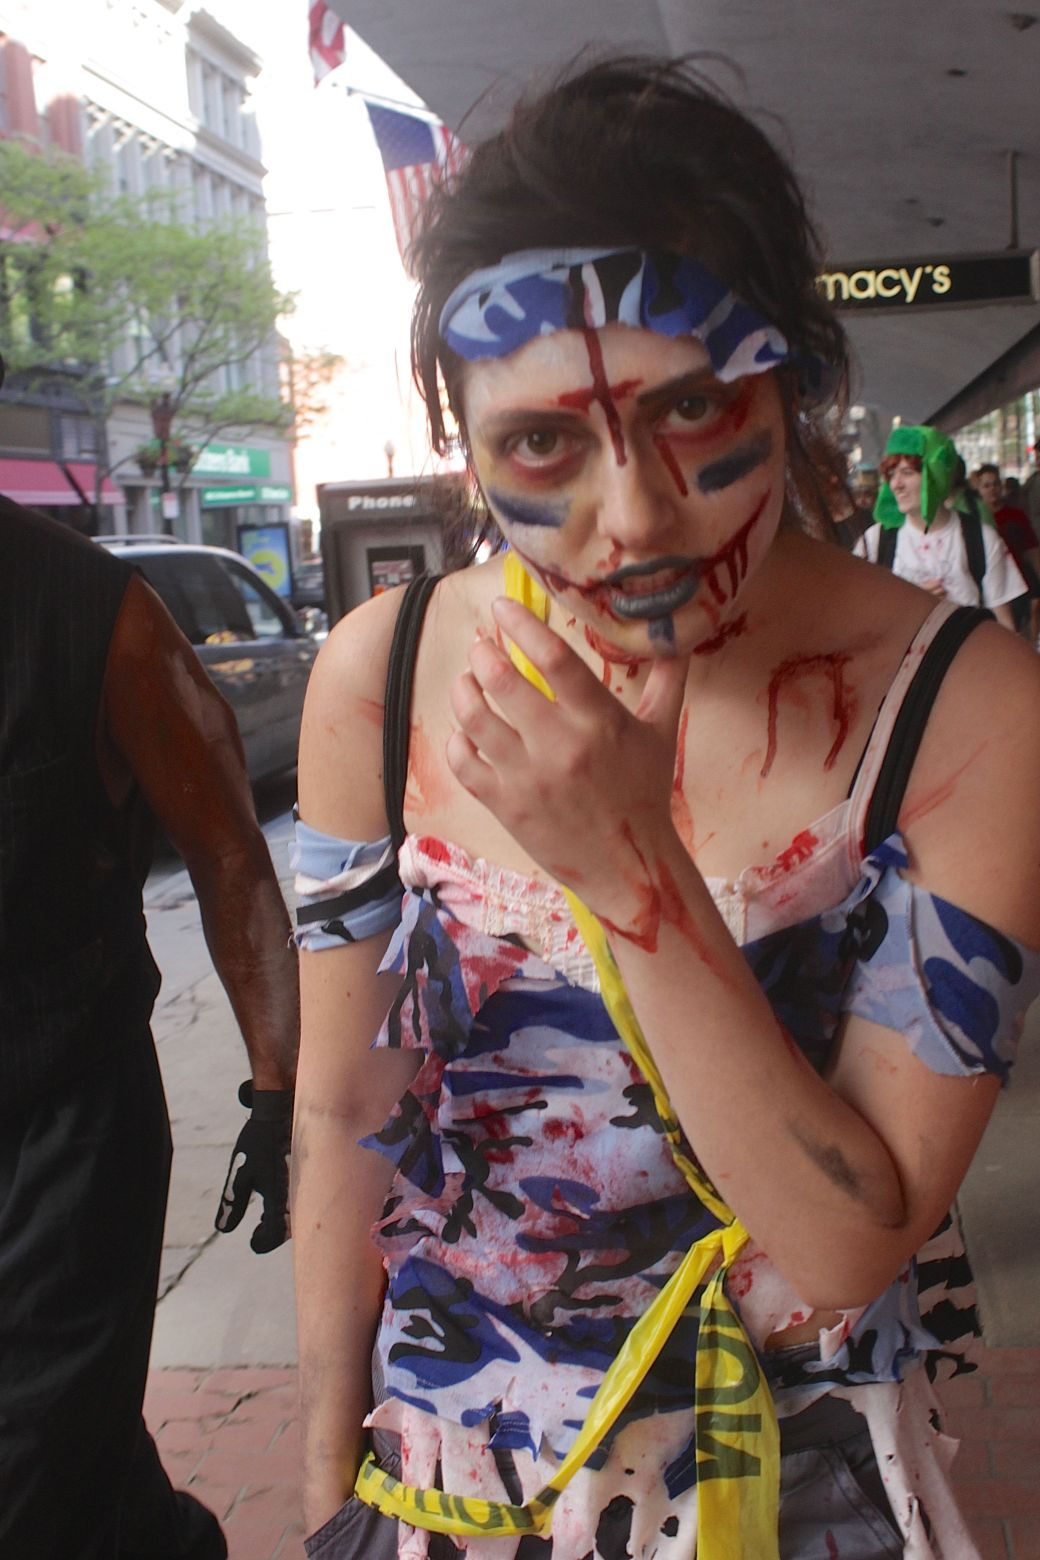 boston zombie walk may 17 5